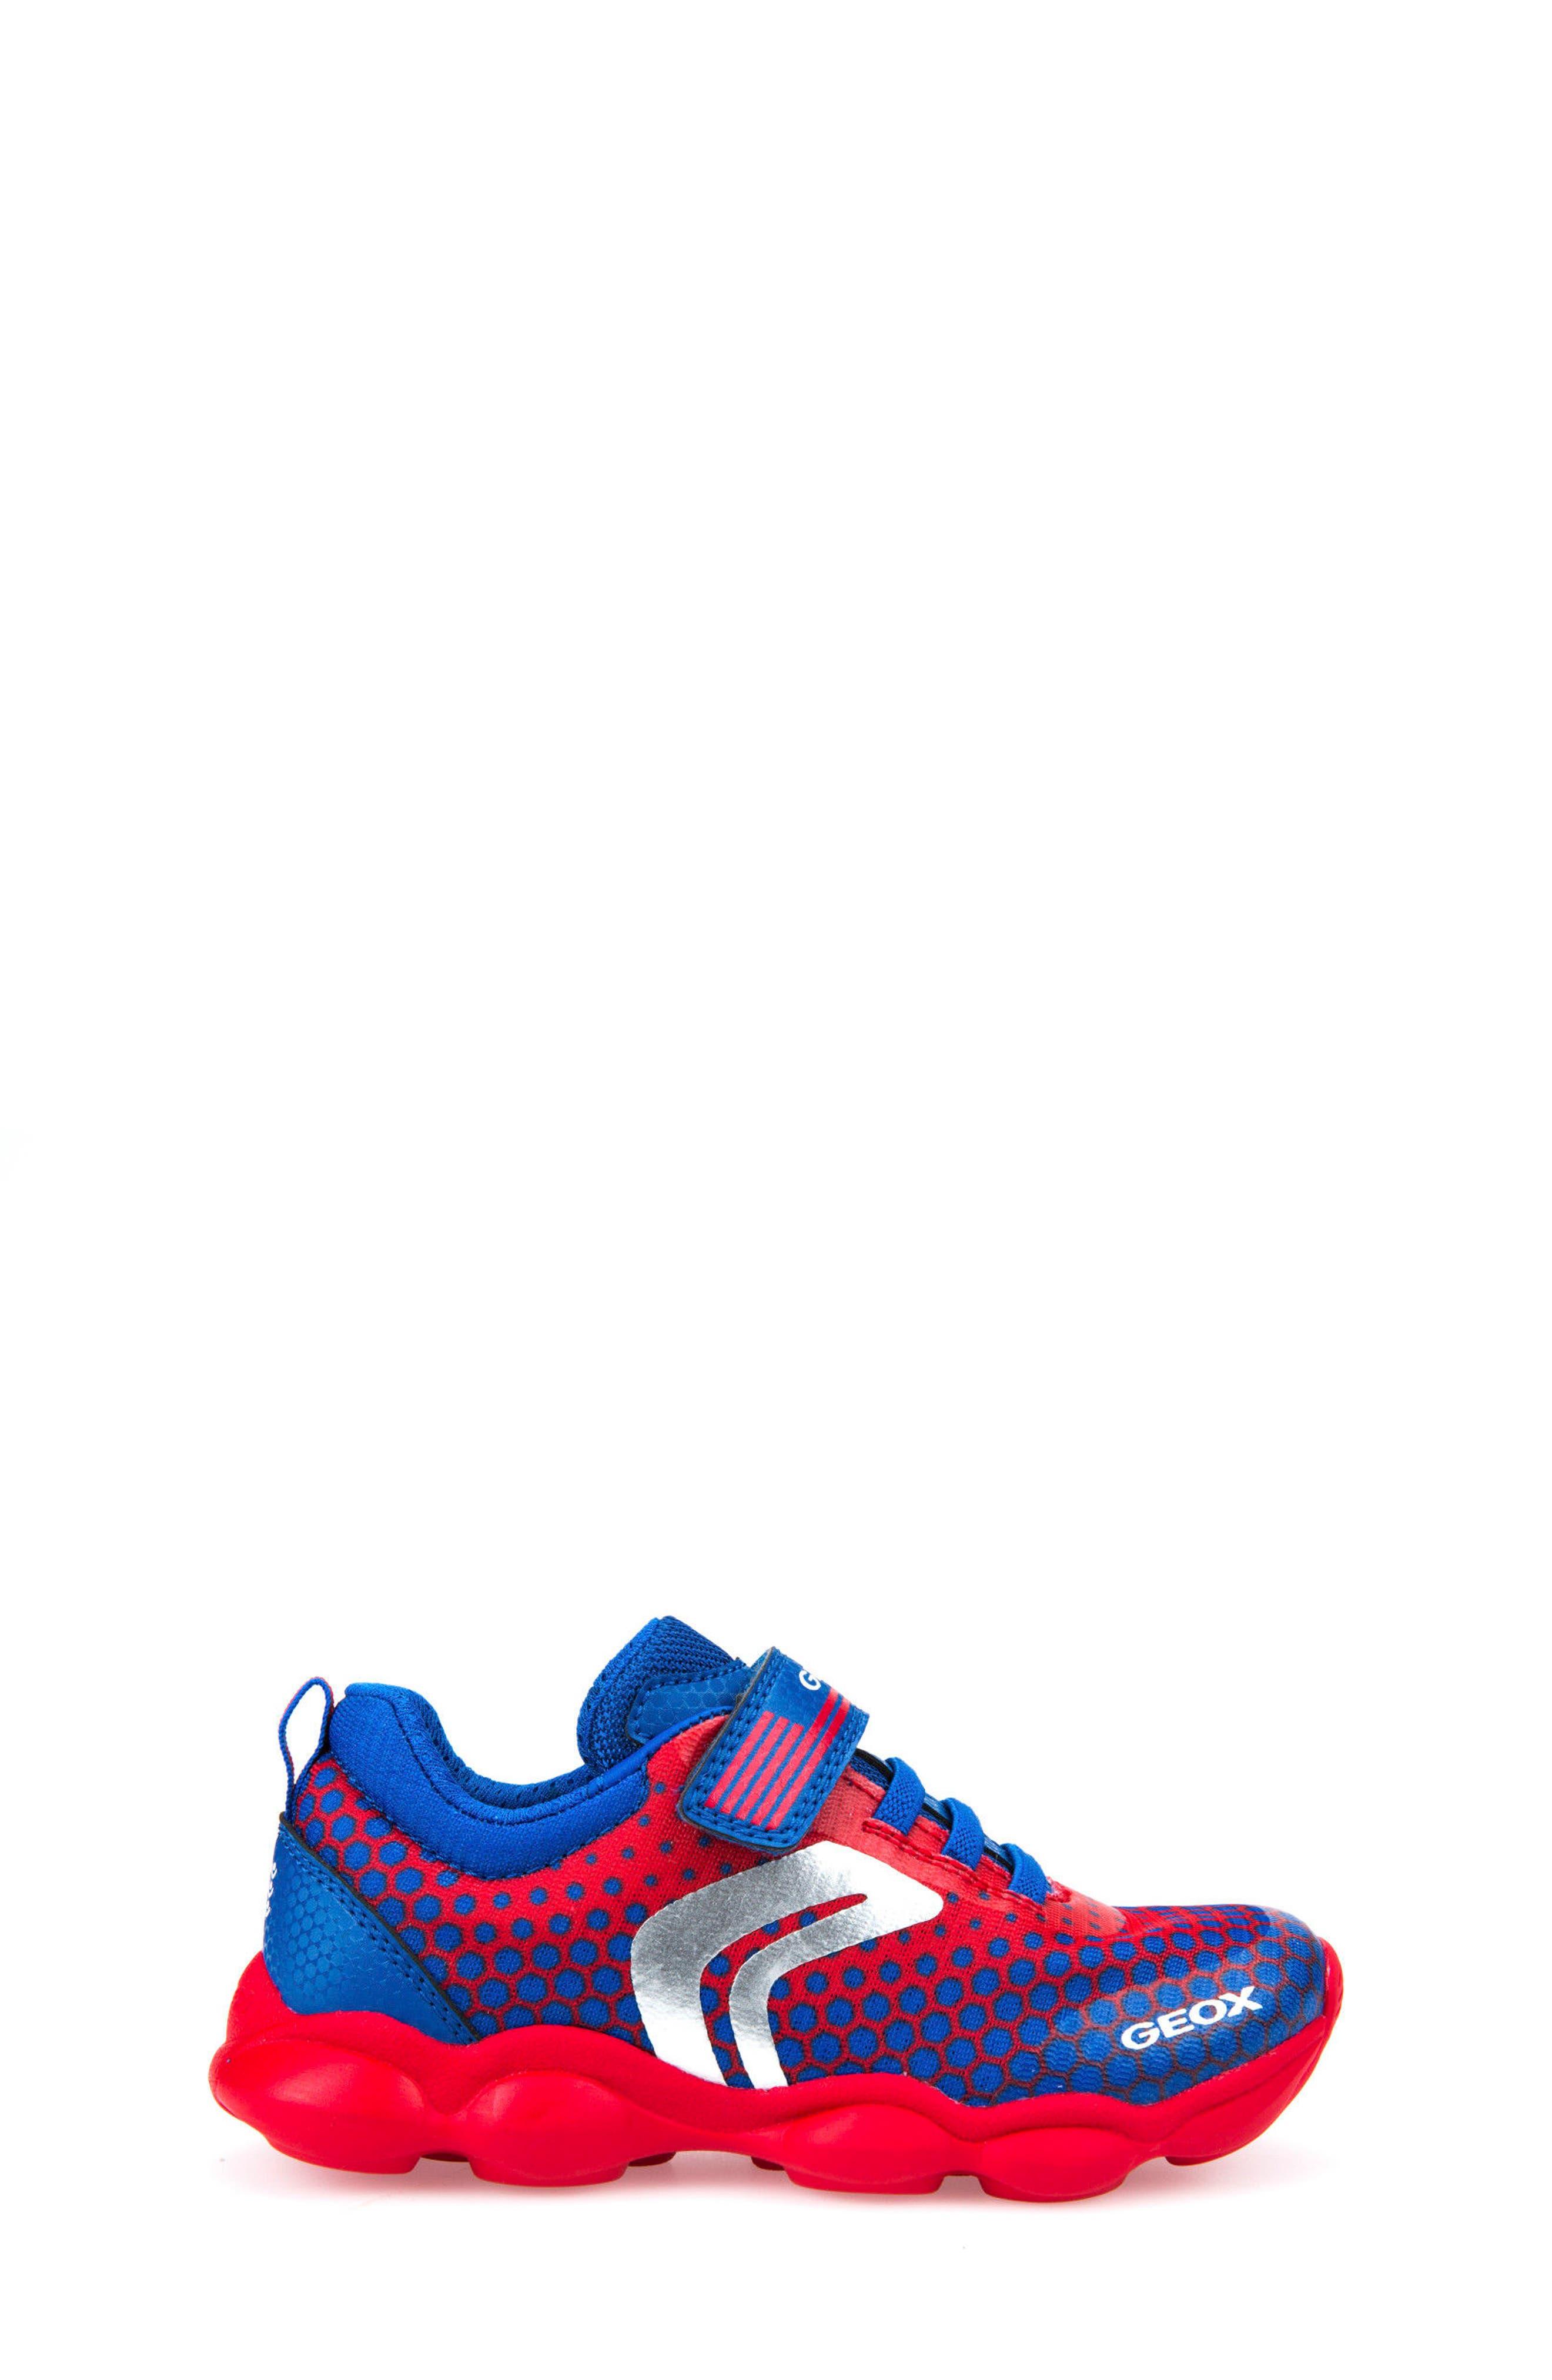 Alternate Image 3  - Geox Munfrey Sneaker (Toddler, Little Kid, Big Kid)